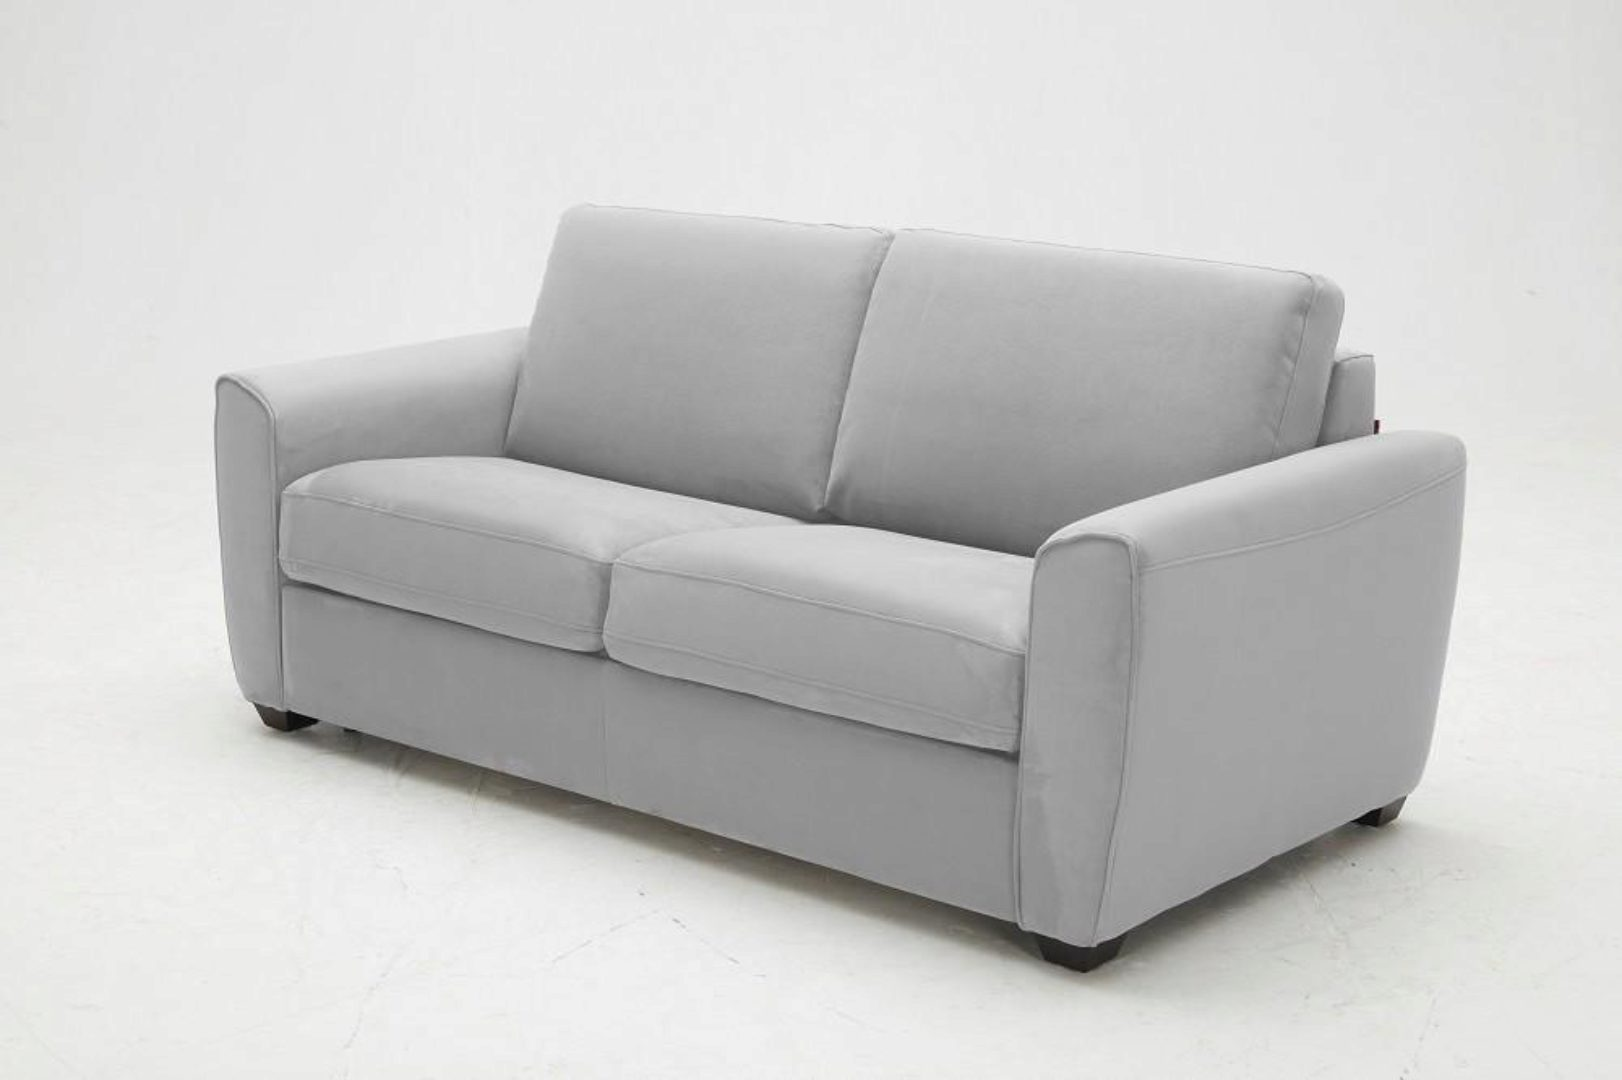 J M Marin Modern Grey Premium Microfiber Foam Mattress Sofa Sleeper Contemporary Sku18235 Sofa Bed